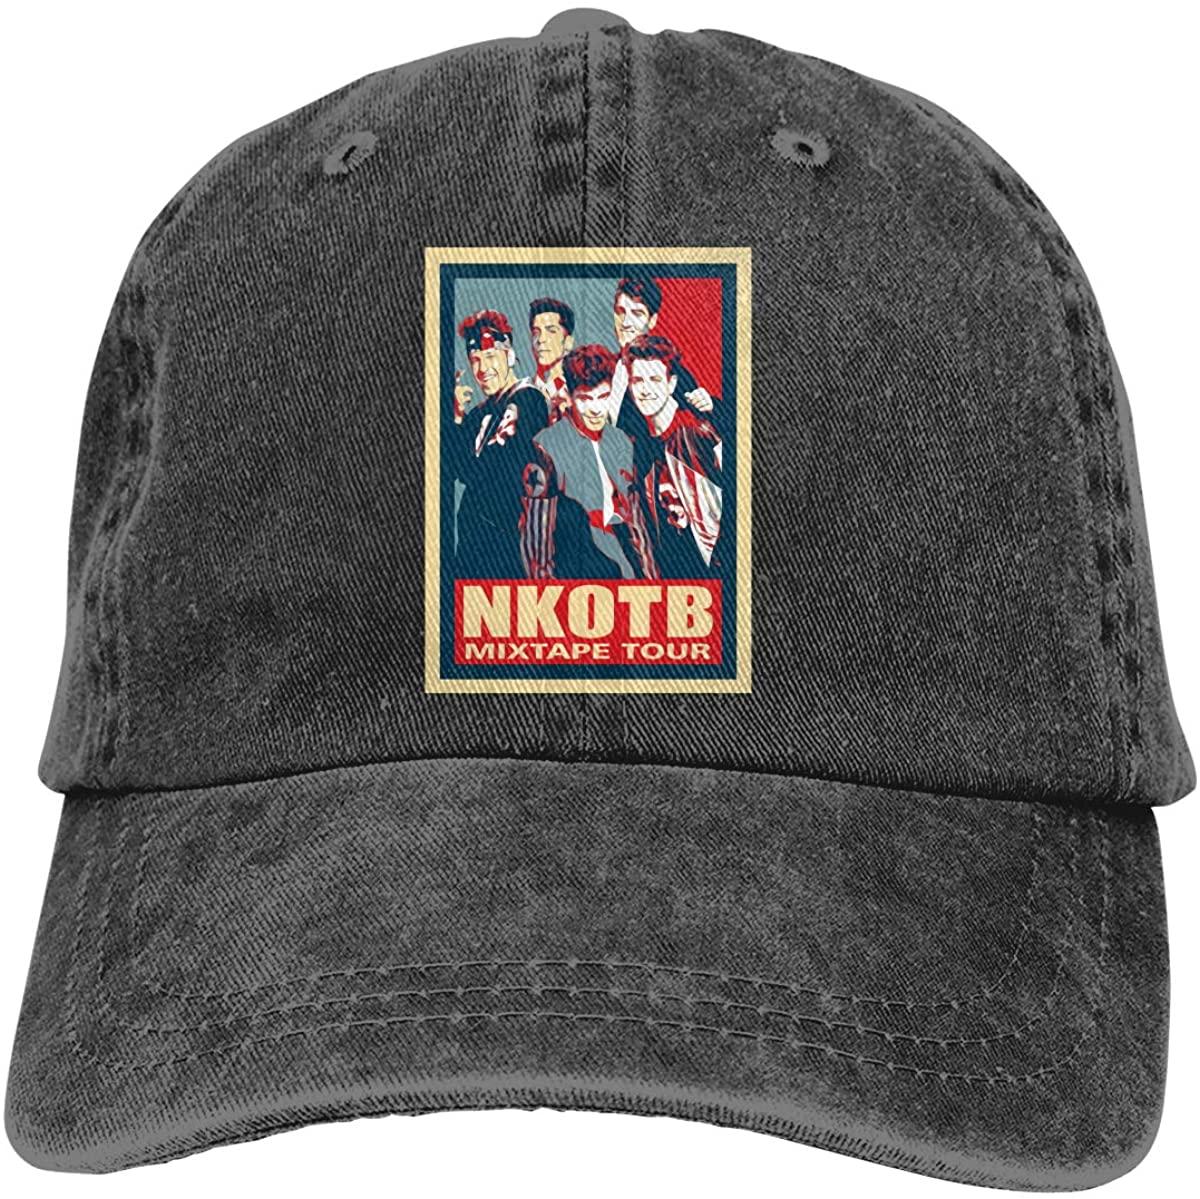 New Kids On The Block The Mixtape Tour Staircase 2019 NKOTB Adjustable Unisex Hat Baseball Caps Black